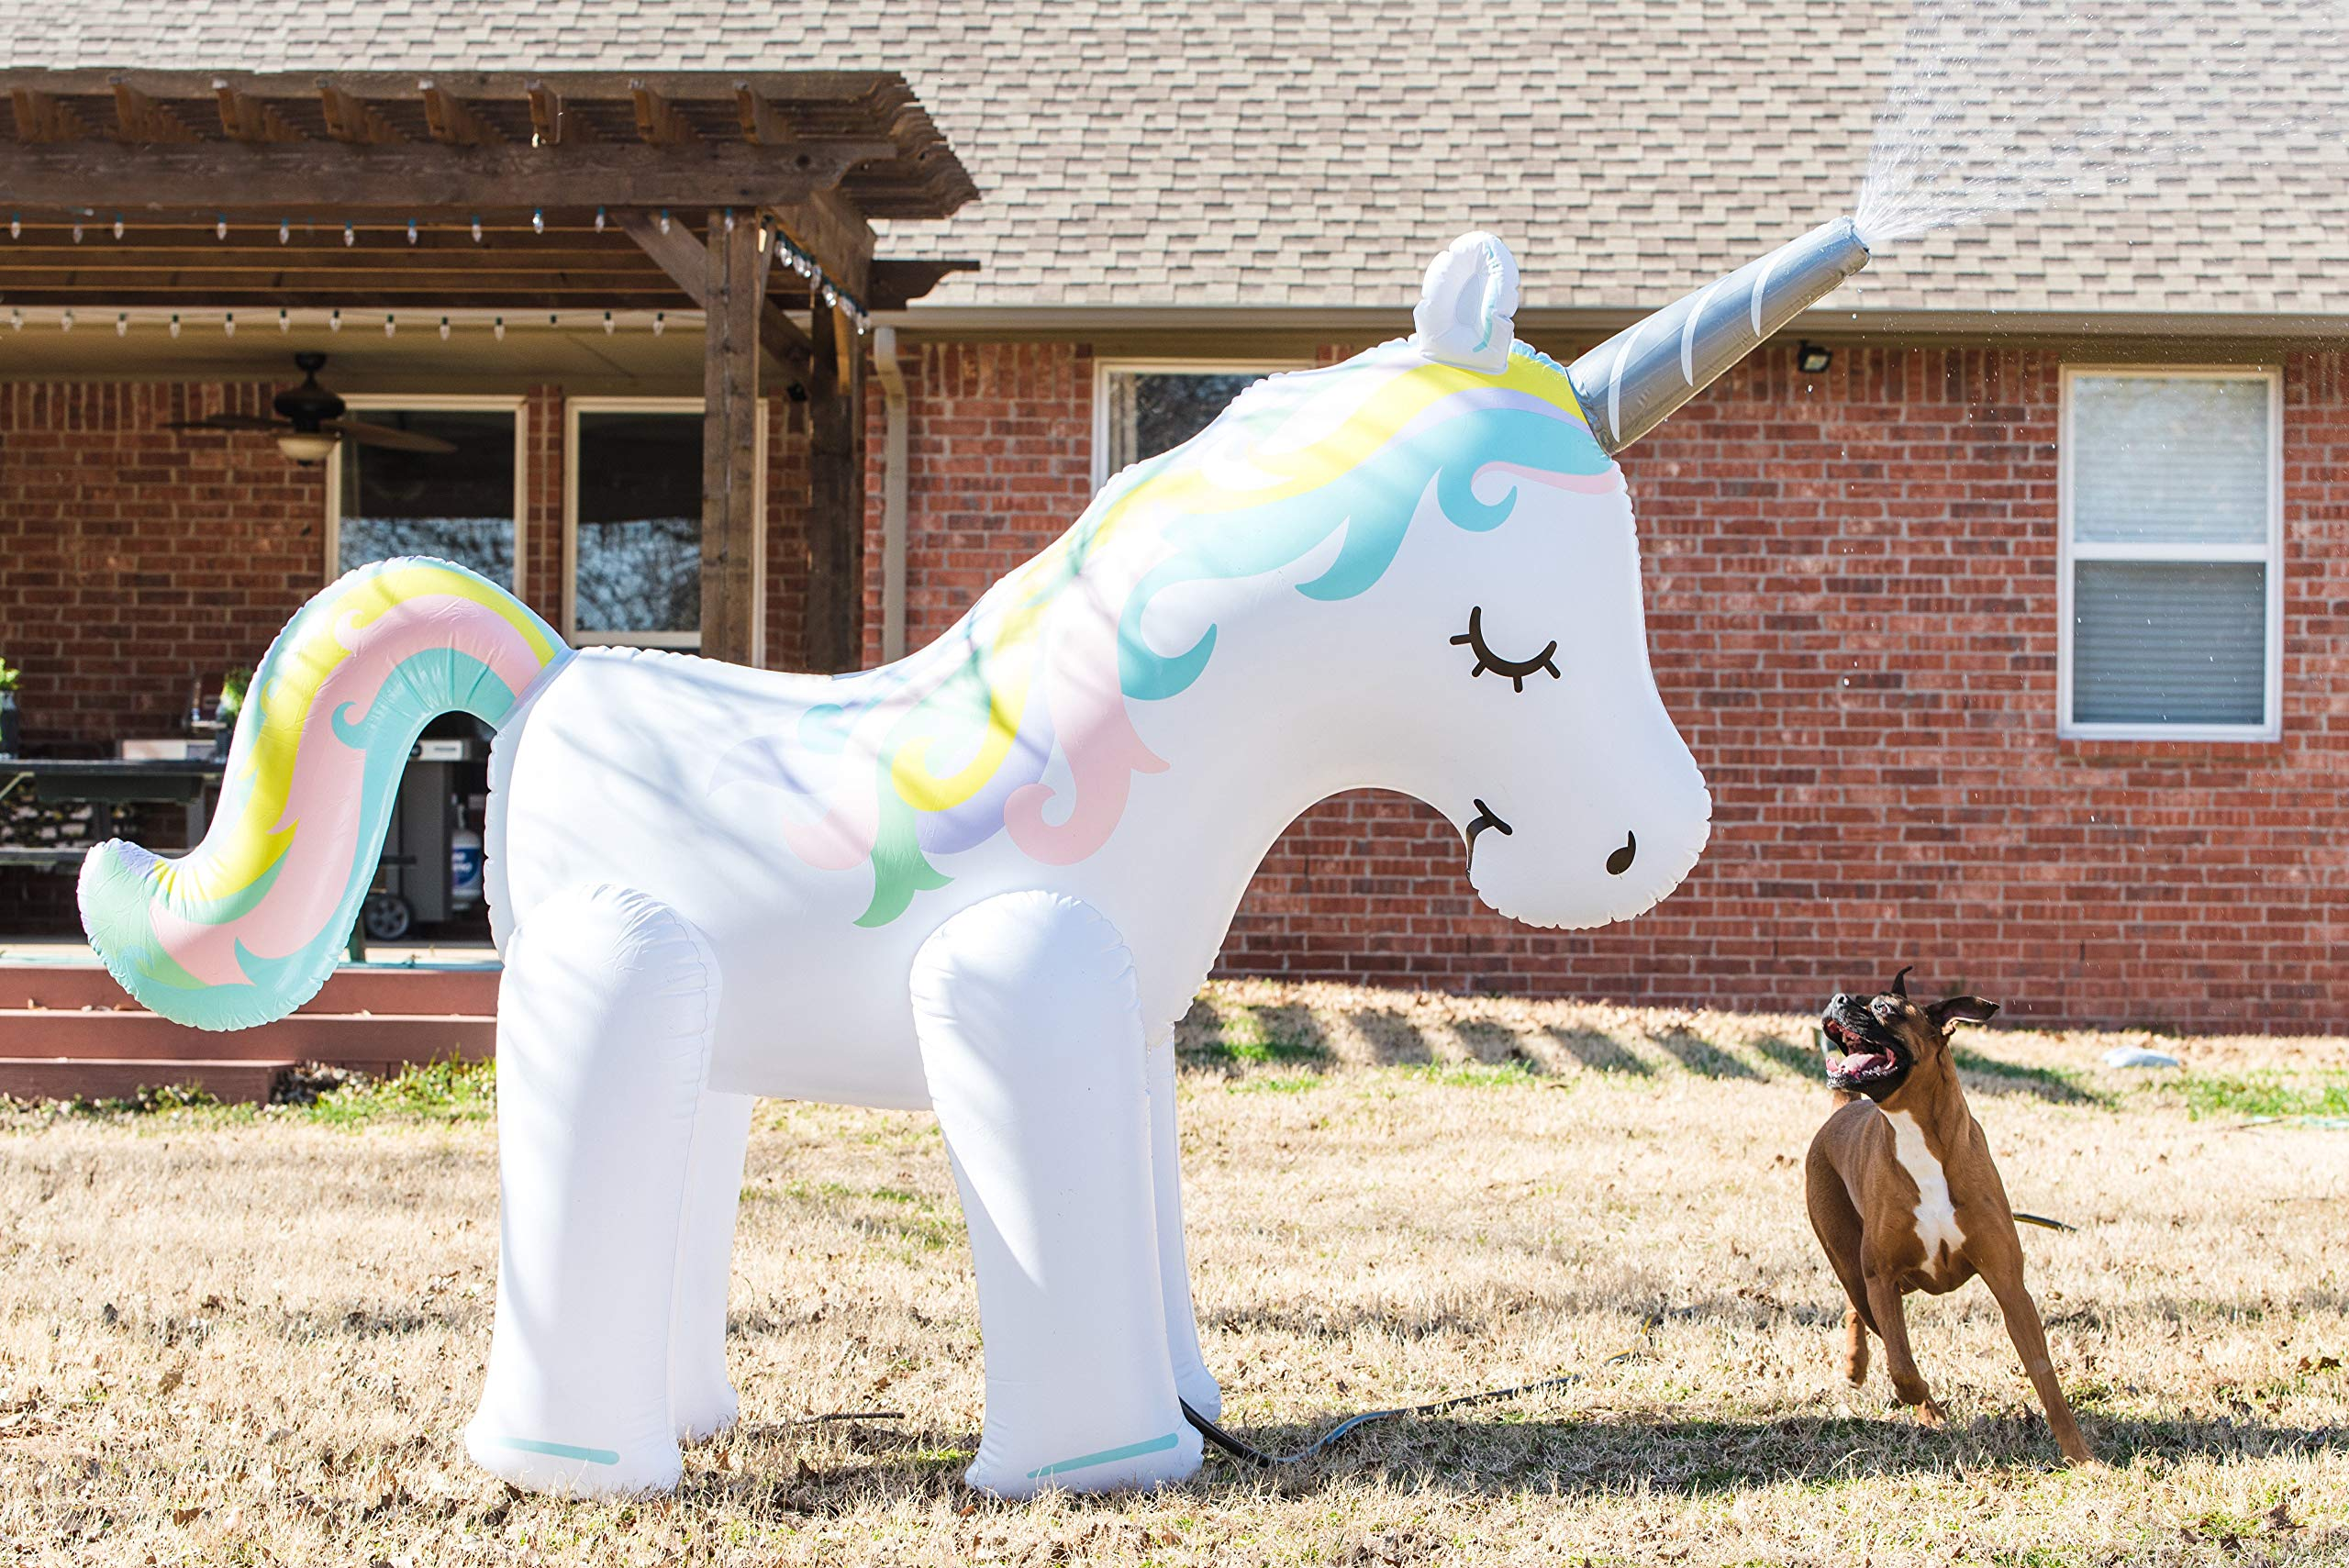 Zoostliss Unicorn Sprinkler Inflatable Water Spray Toys Giant Yard Backyard Lawn Unicorn Sprinkler Kids Outdoor Party… 5